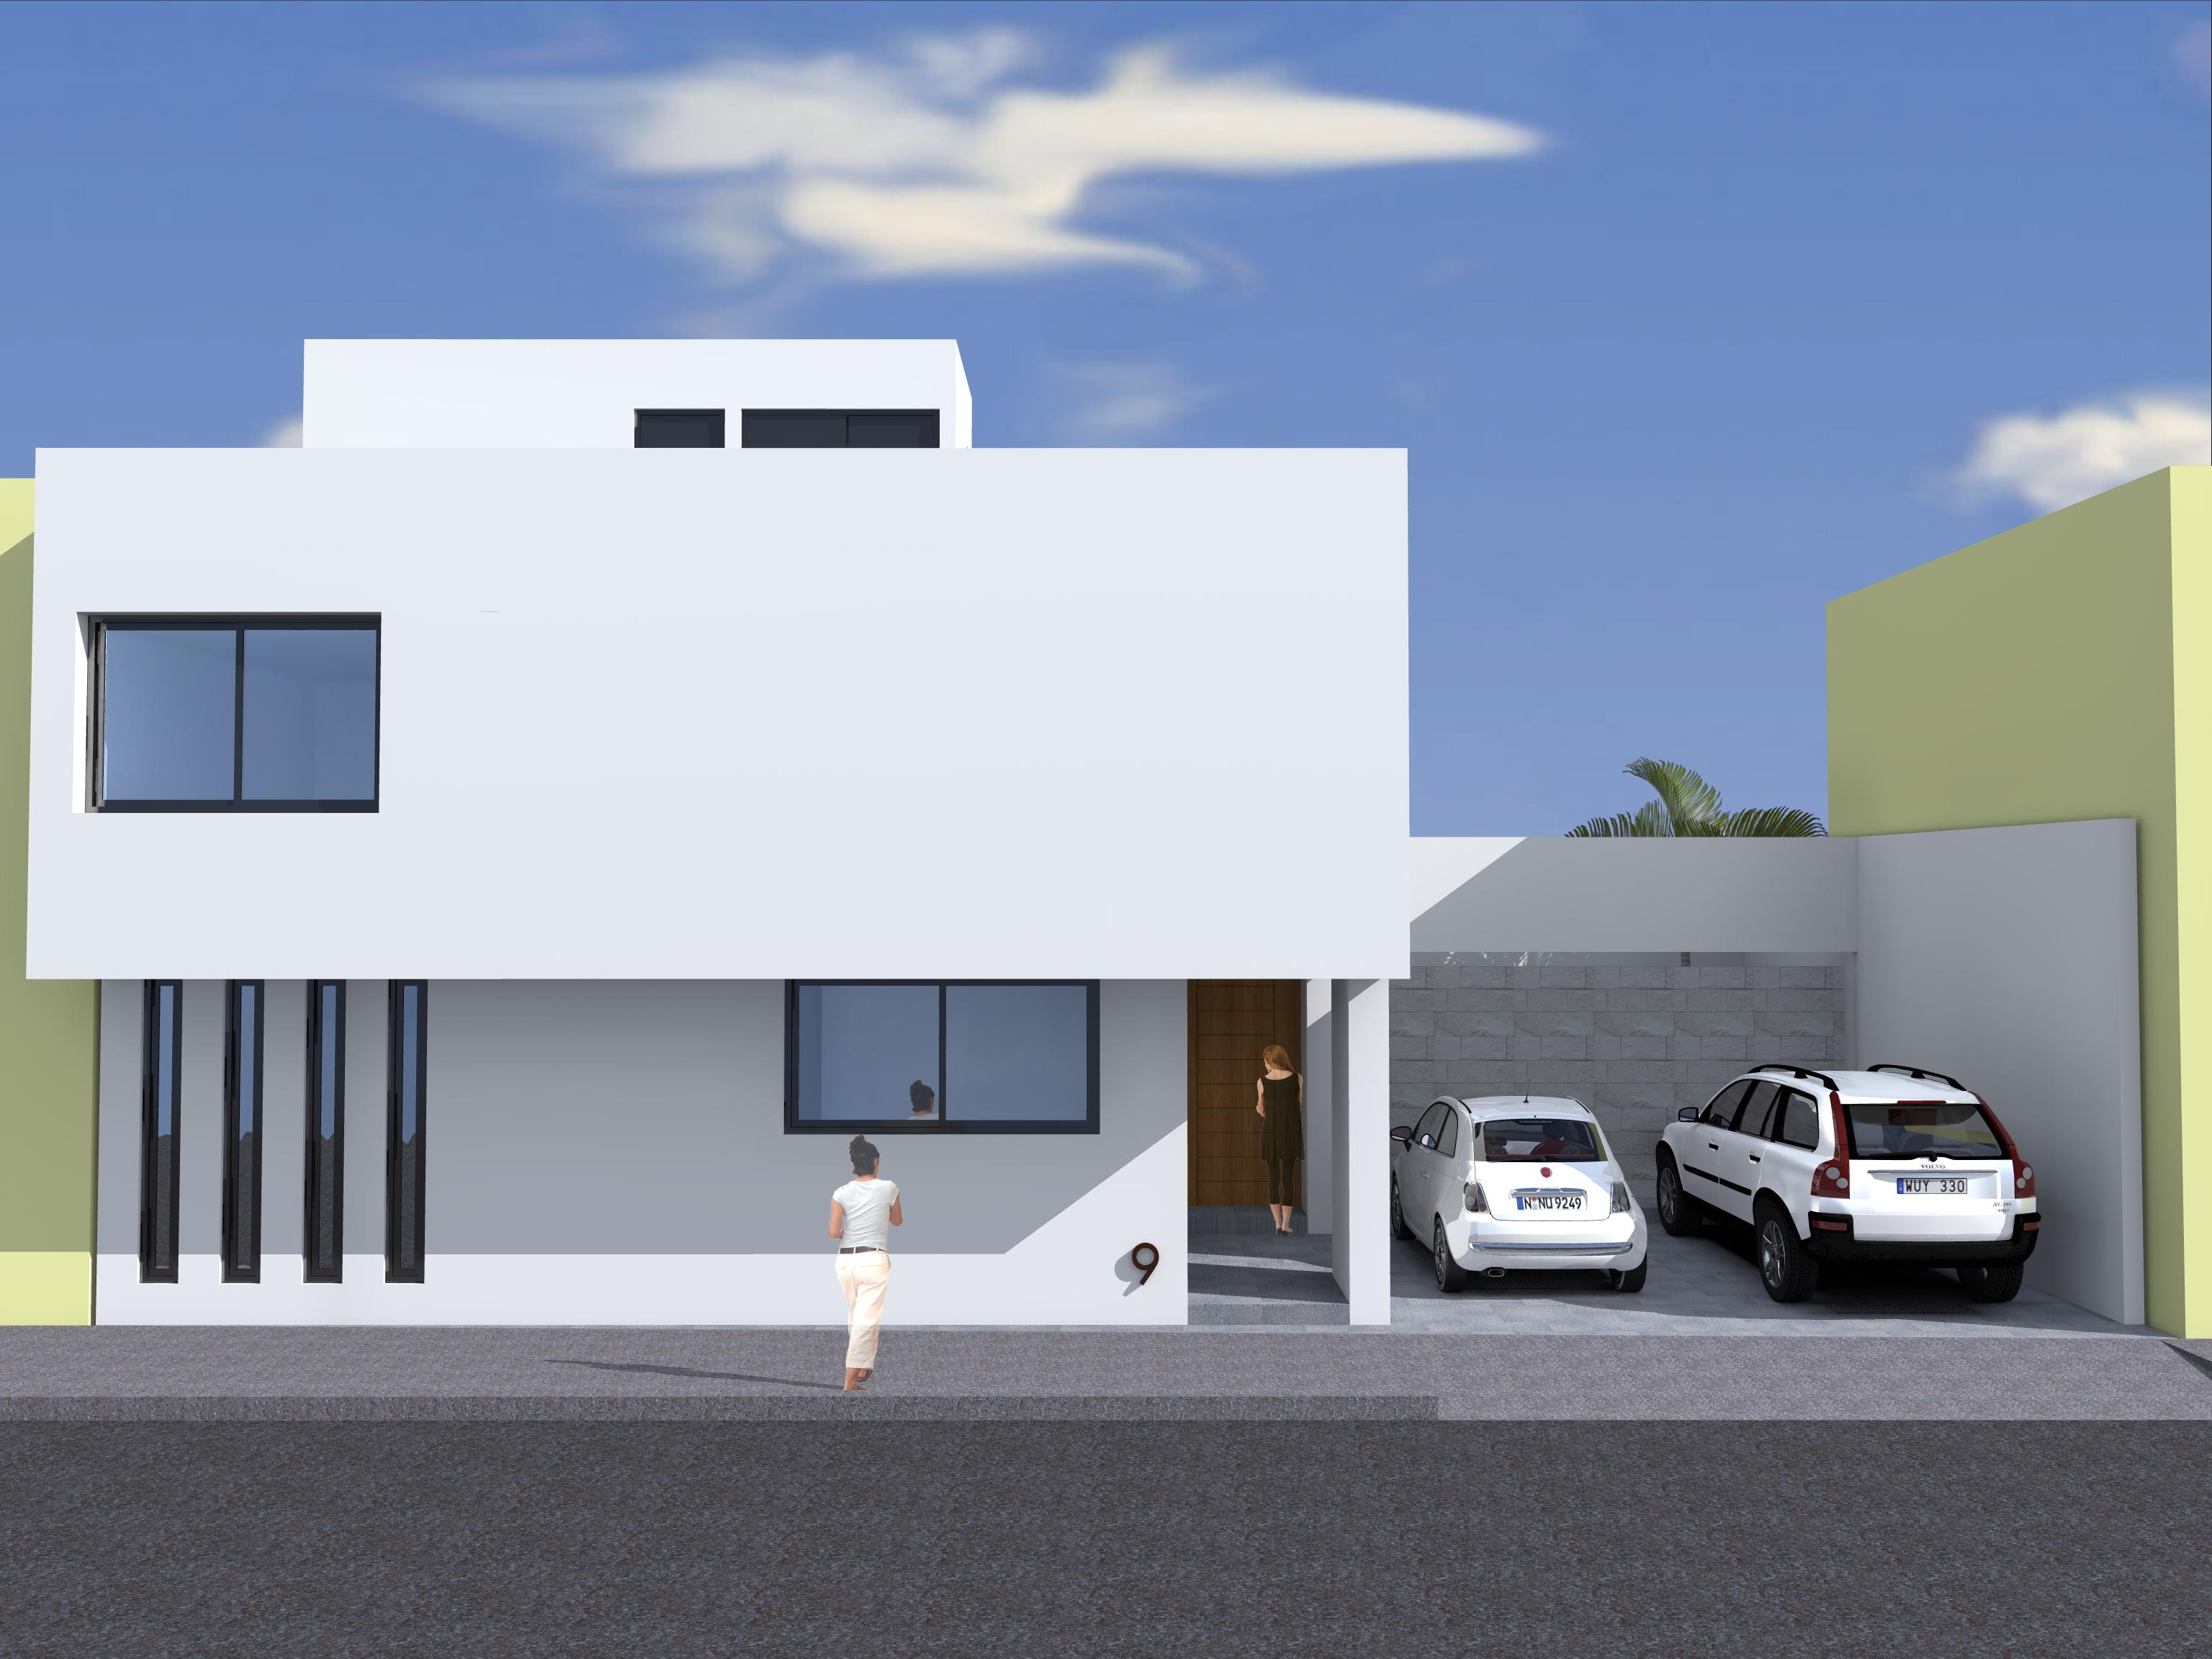 Anteproyecto C - Casa Cimazul